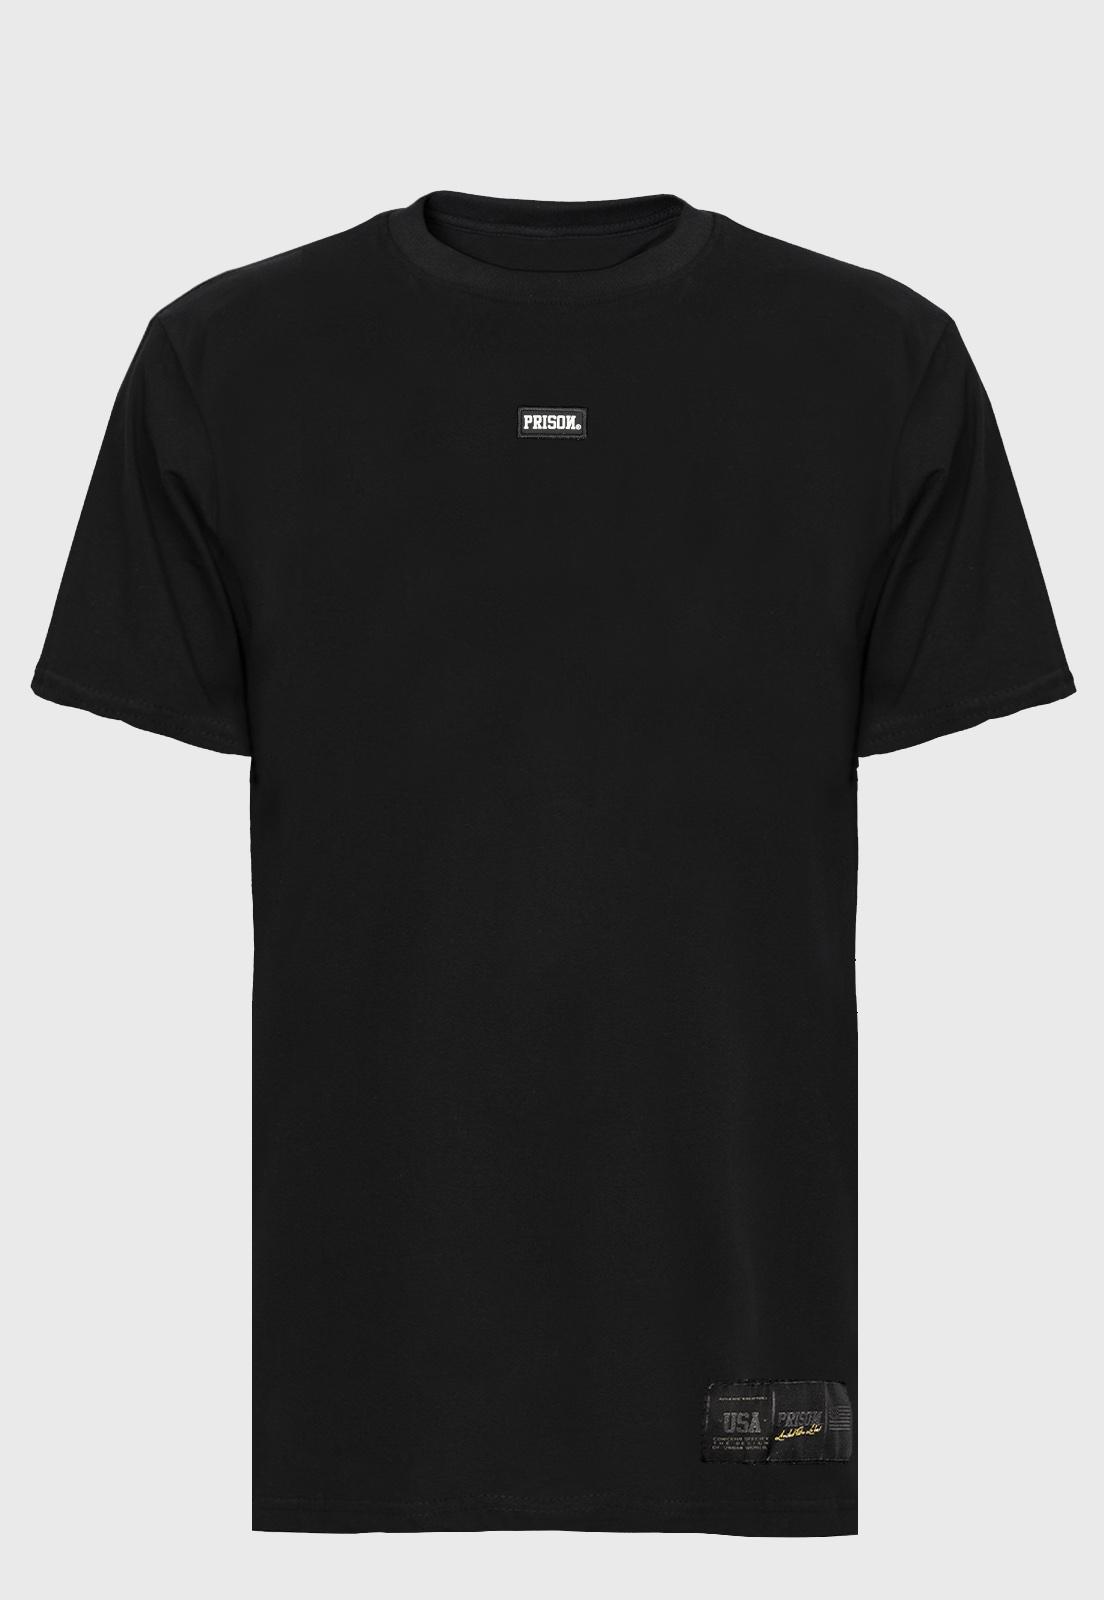 Camiseta Bordada   Streetwear Logo  Prison